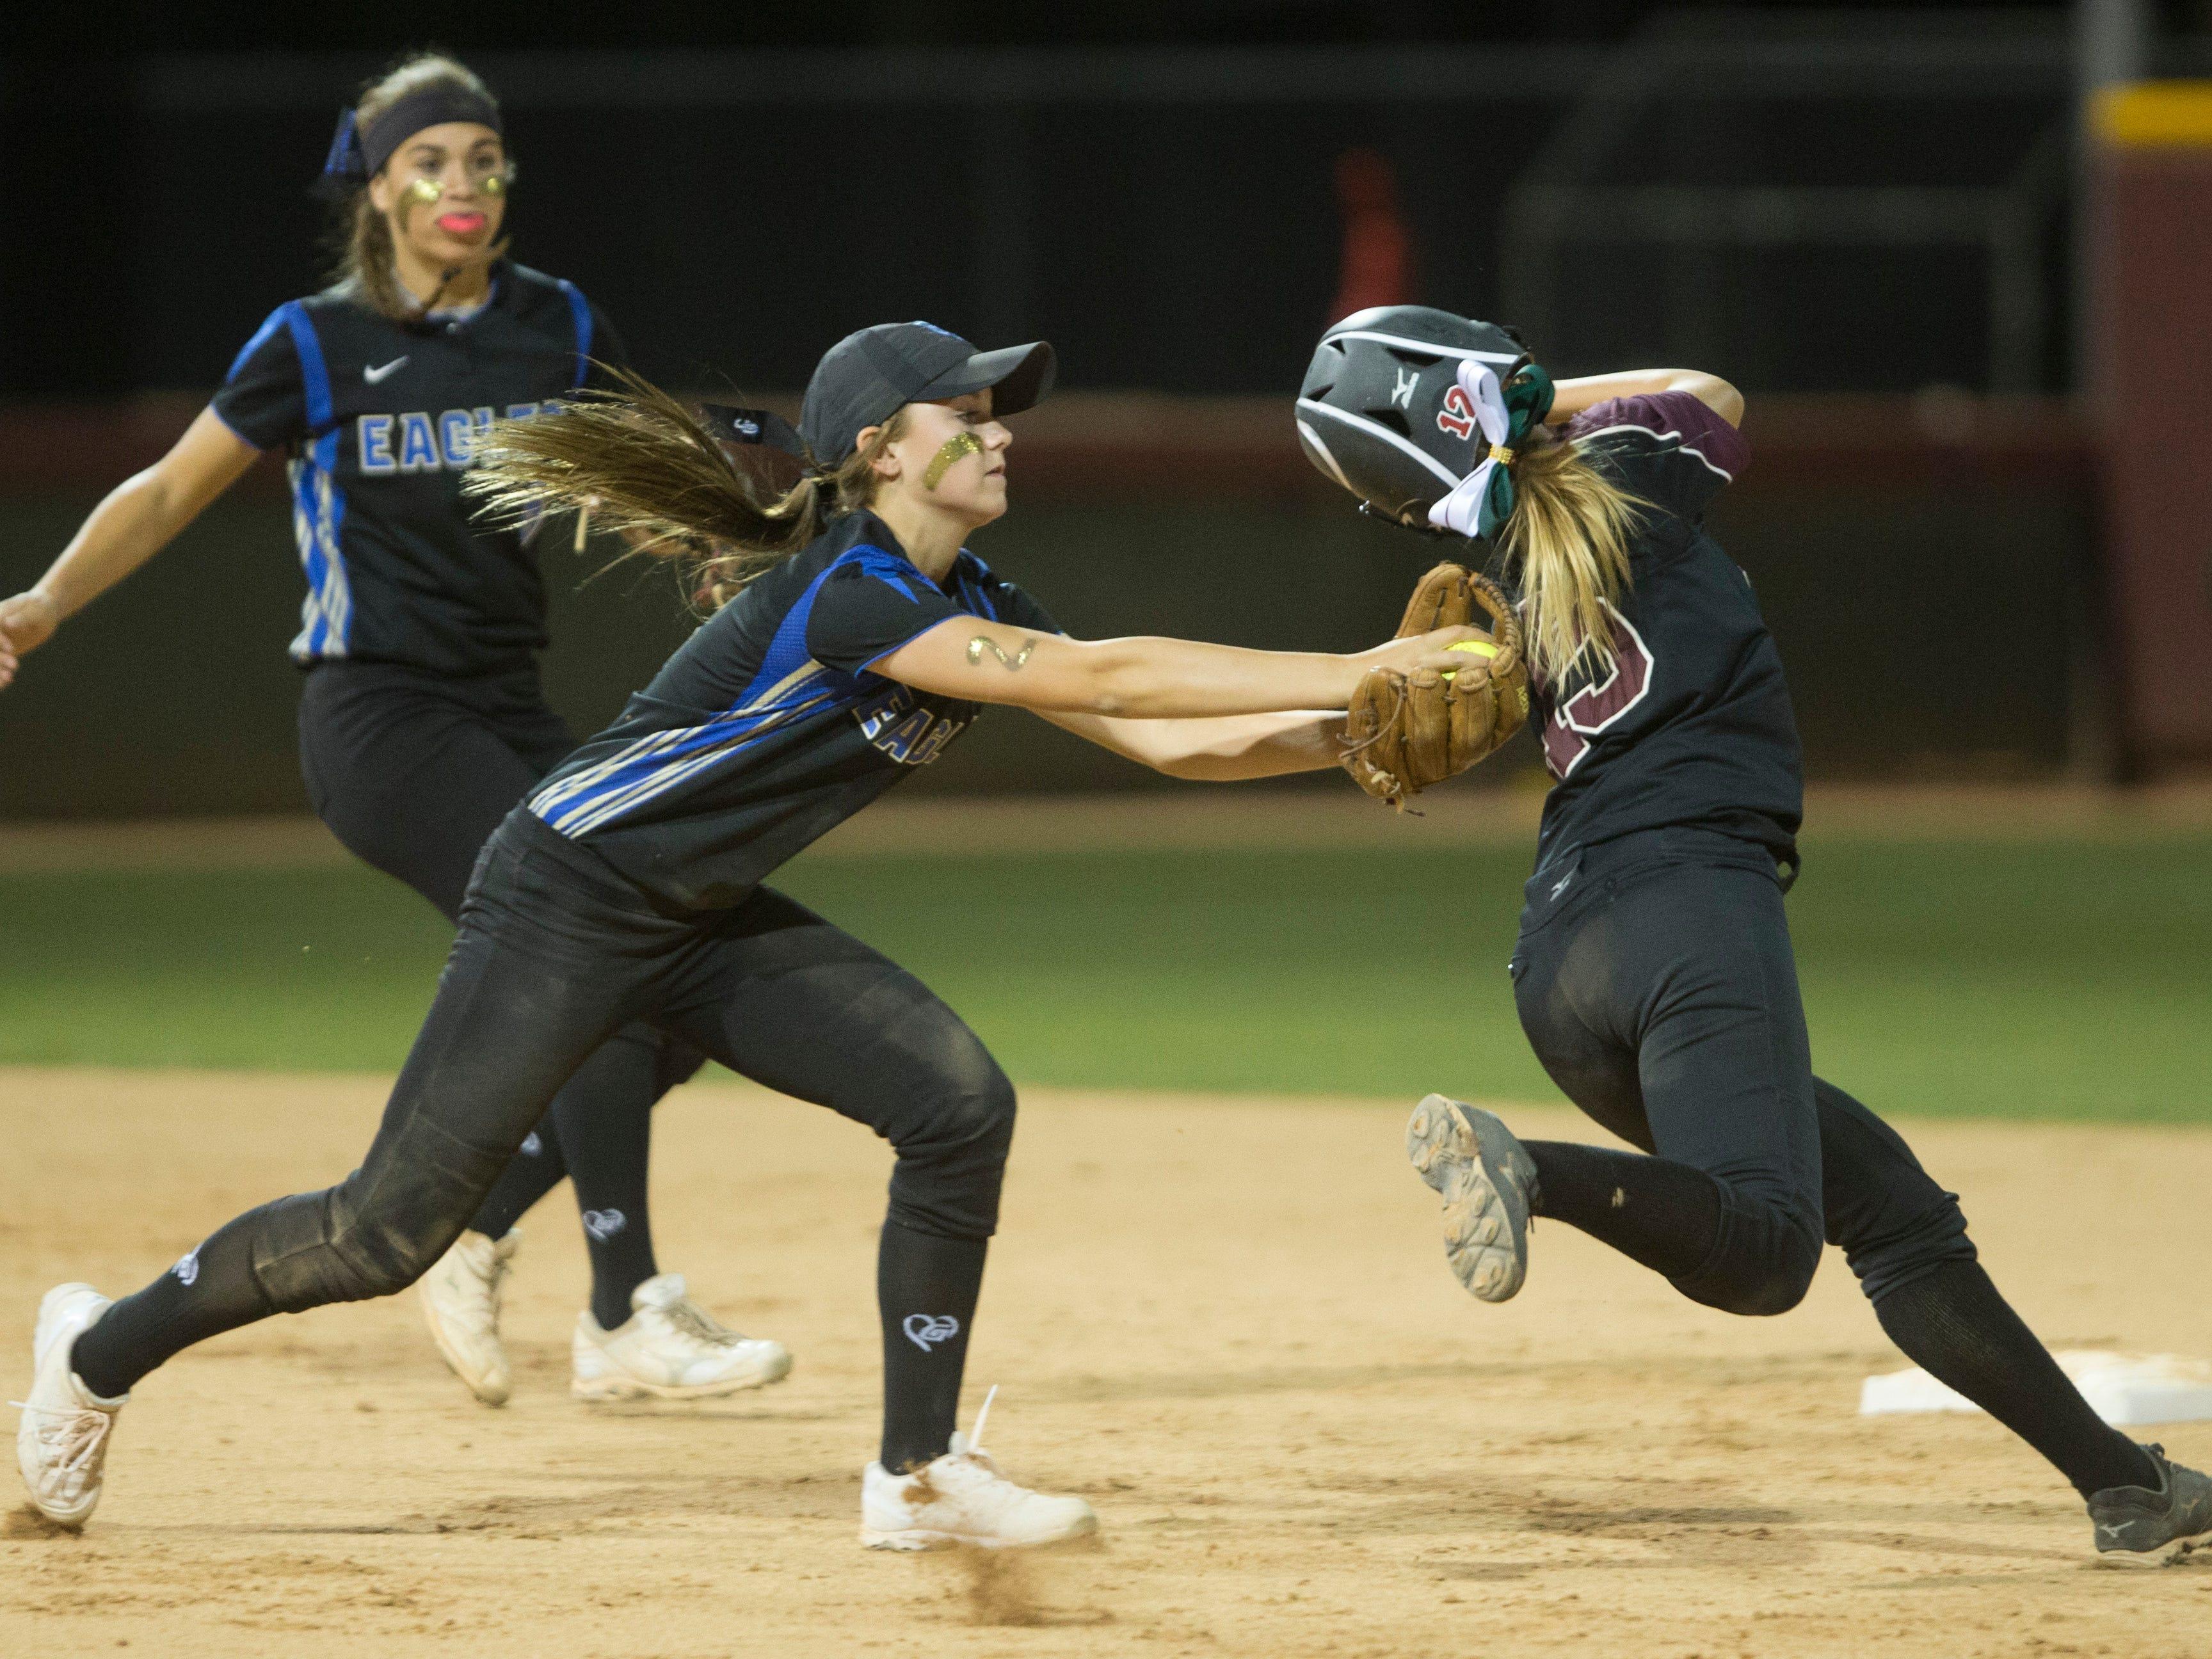 Sandra Day O'Connor's Savanna Avilla (2) tags Mountain Ridge's Jailene Carpio (15) as she heads to second base during the D1 State Softball Championship at Farrington Softball Stadium in Tempe, AZ on May 18, 2015.